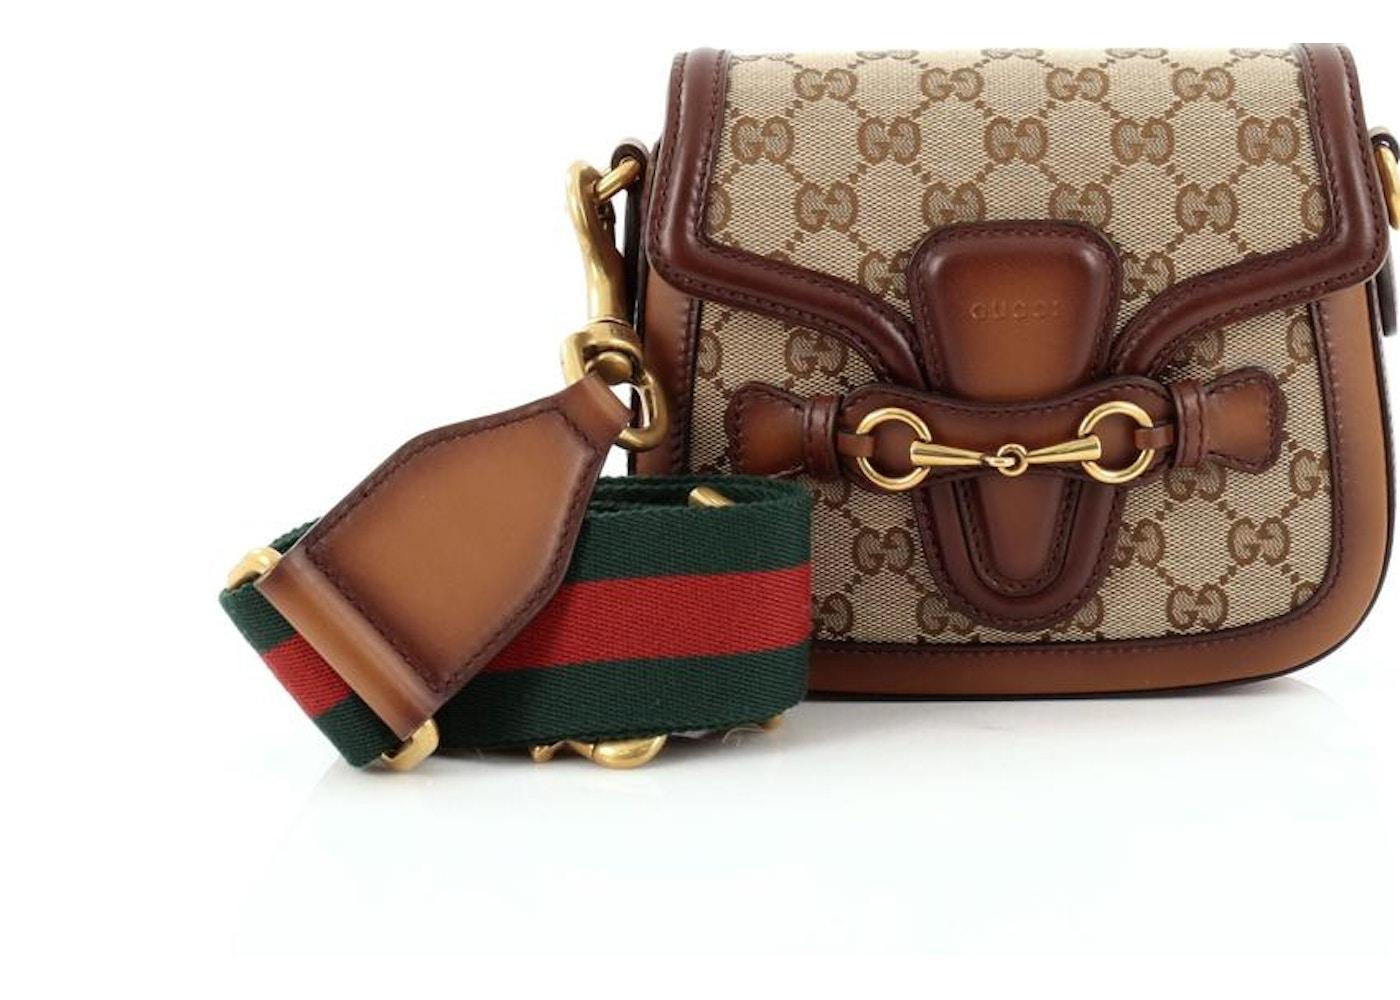 e40b55c065d Gucci Lady Web Shoulder Bag Monogram GG Small Brown Beige ...